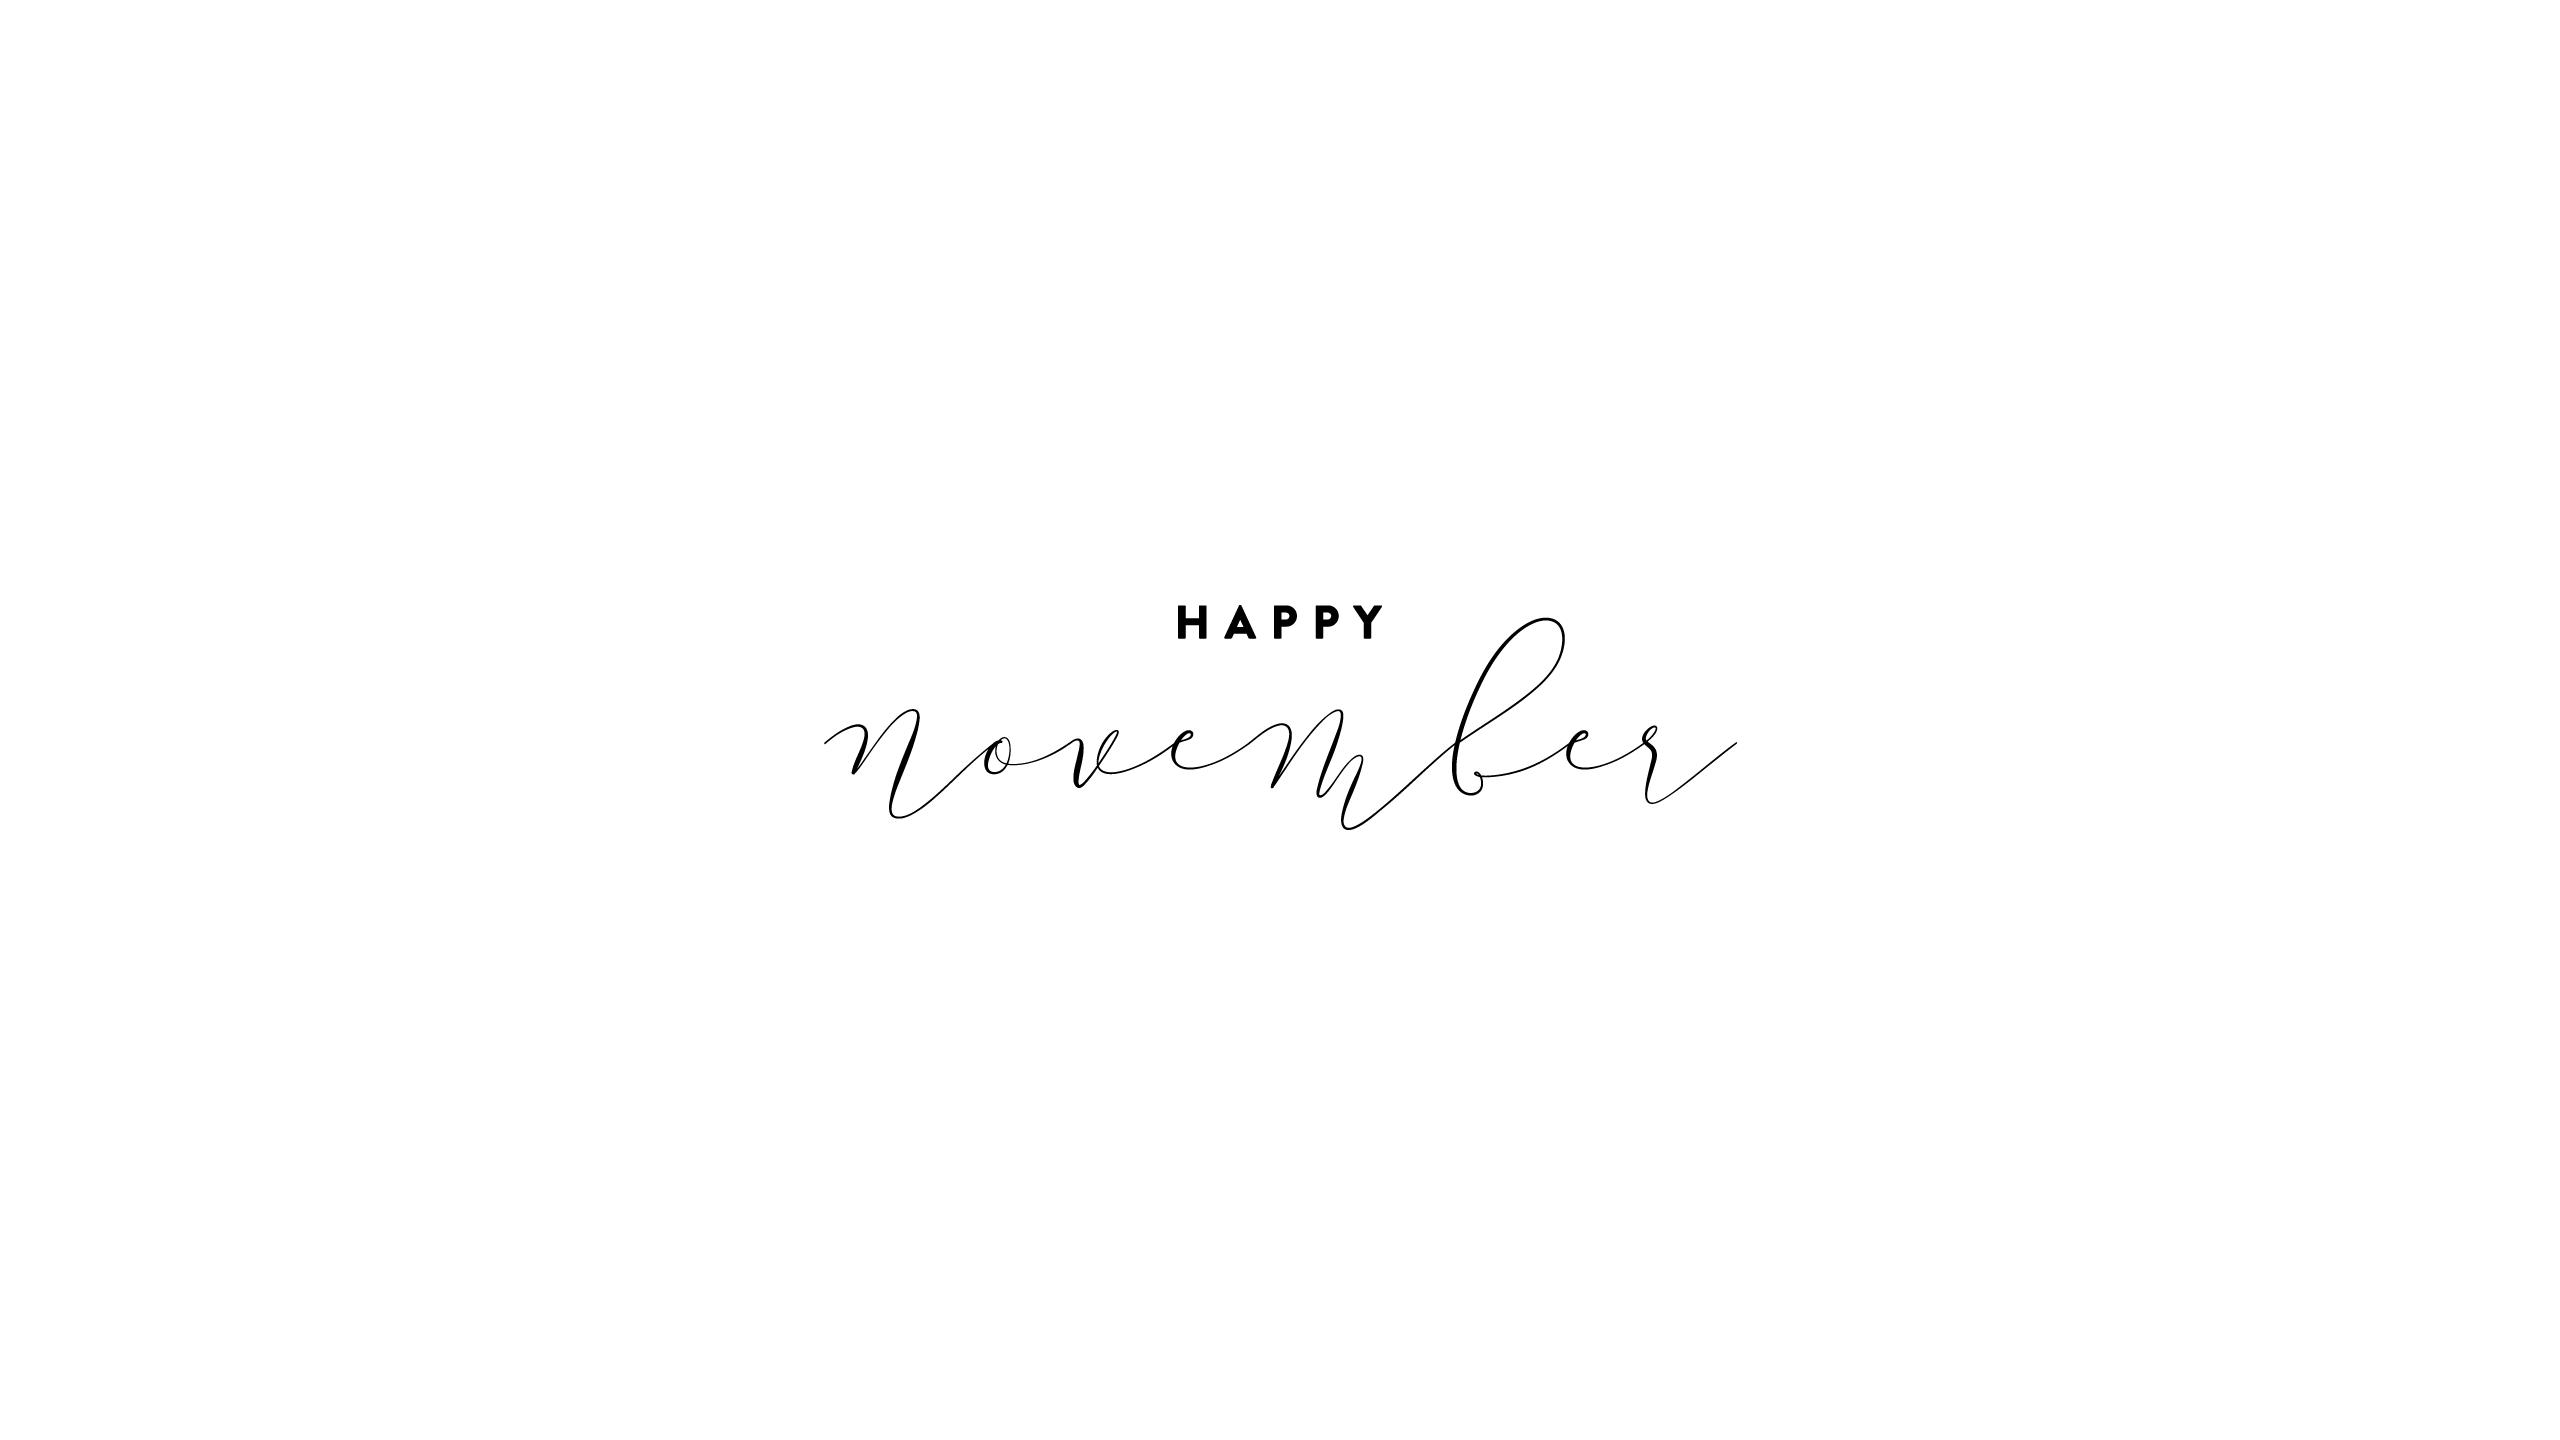 Calendar · Happy November · Verse